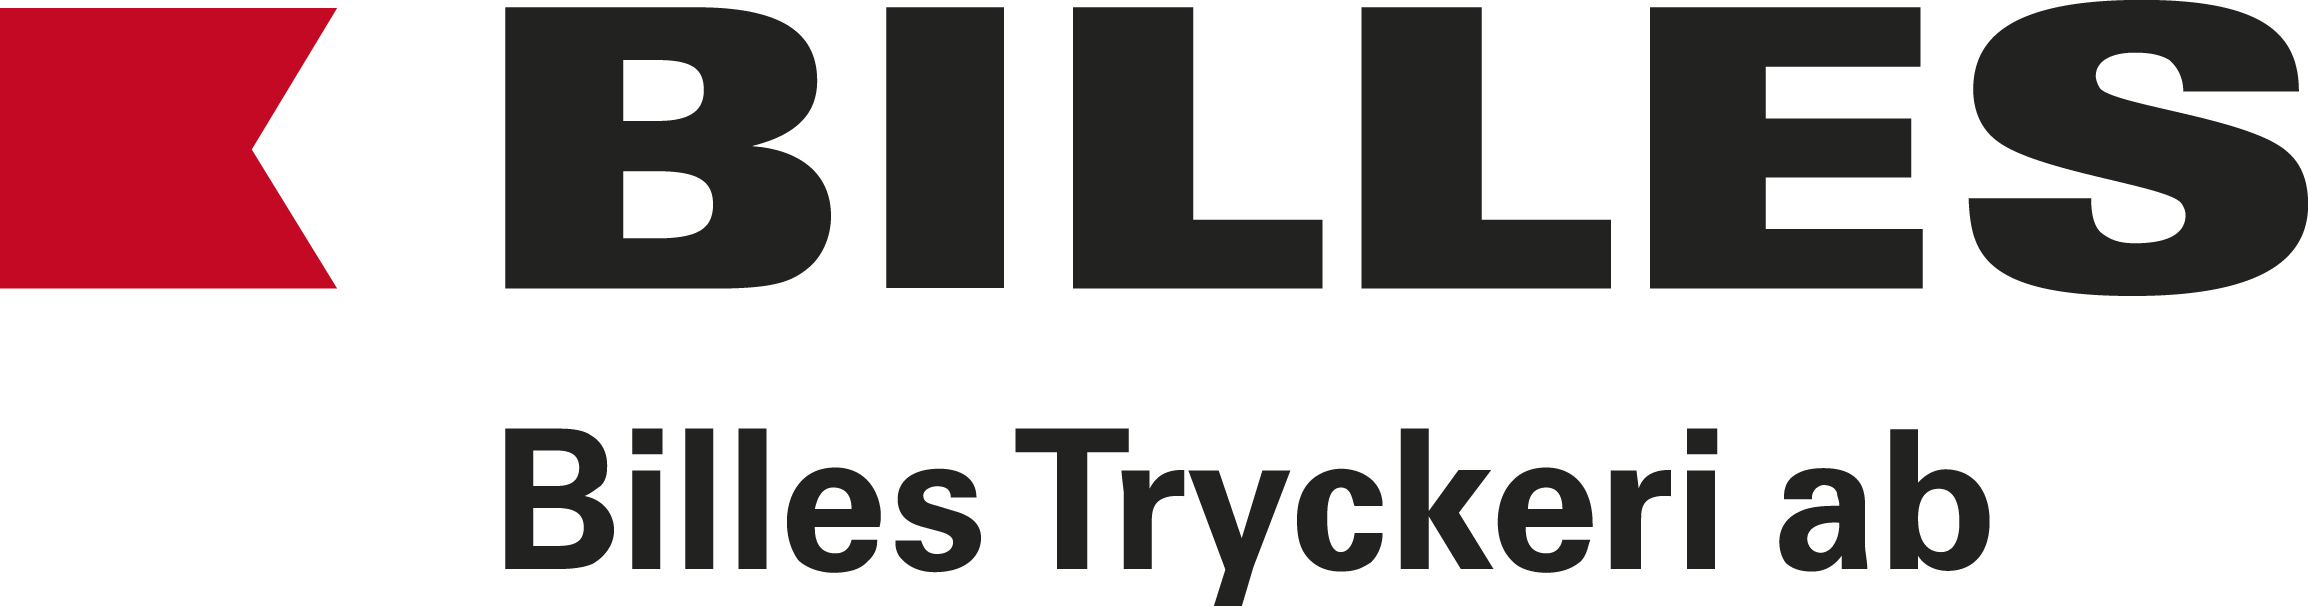 Billes_logo